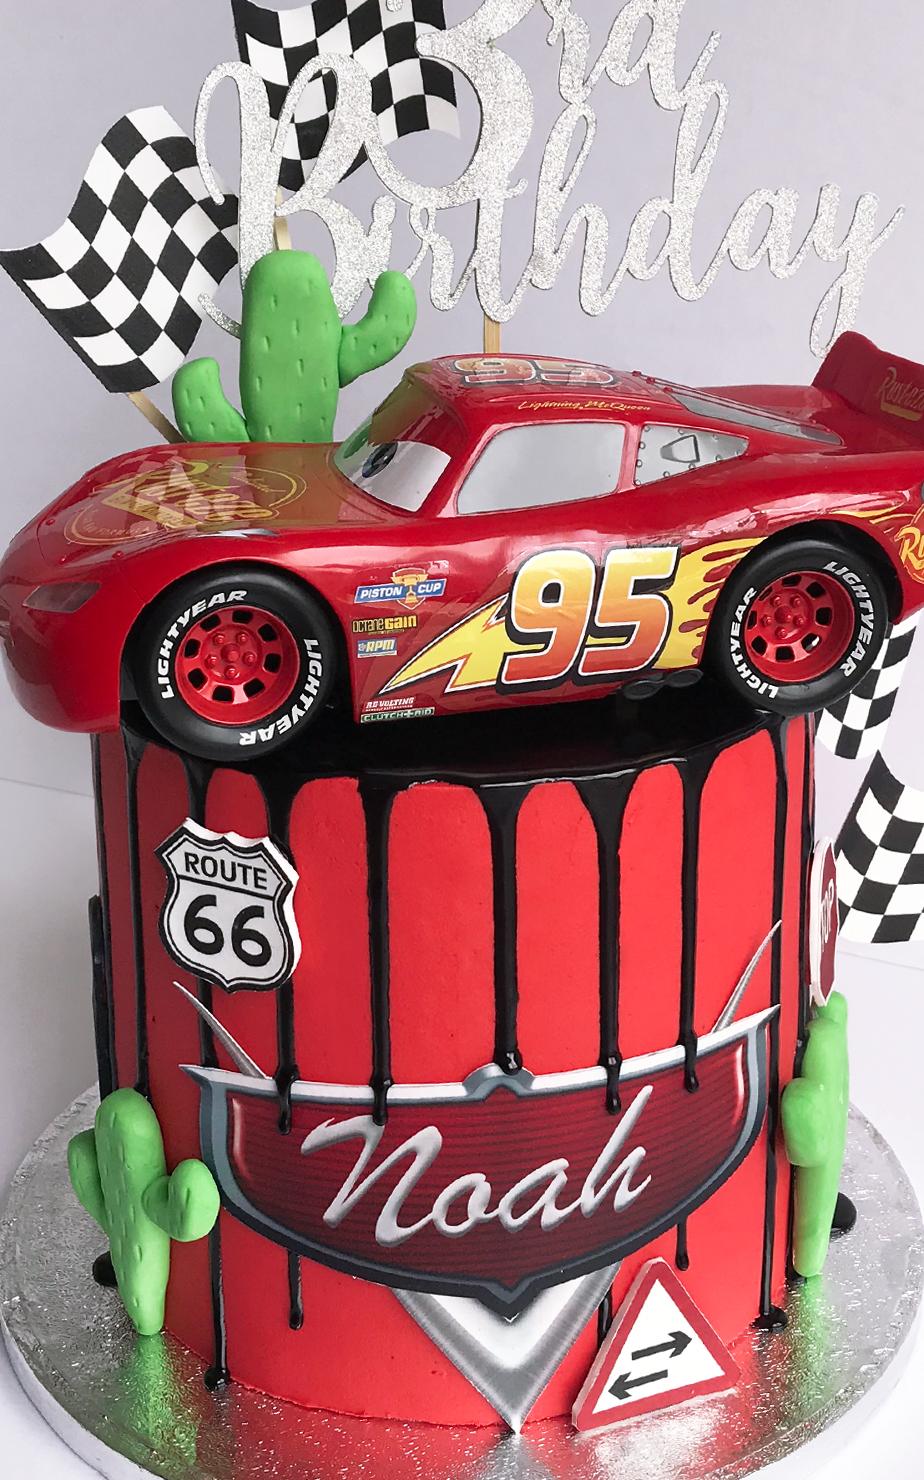 Fabulous Cars Cake Celebration Drip Cakes Antonias Cakes Cake Shop St Helens Personalised Birthday Cards Veneteletsinfo